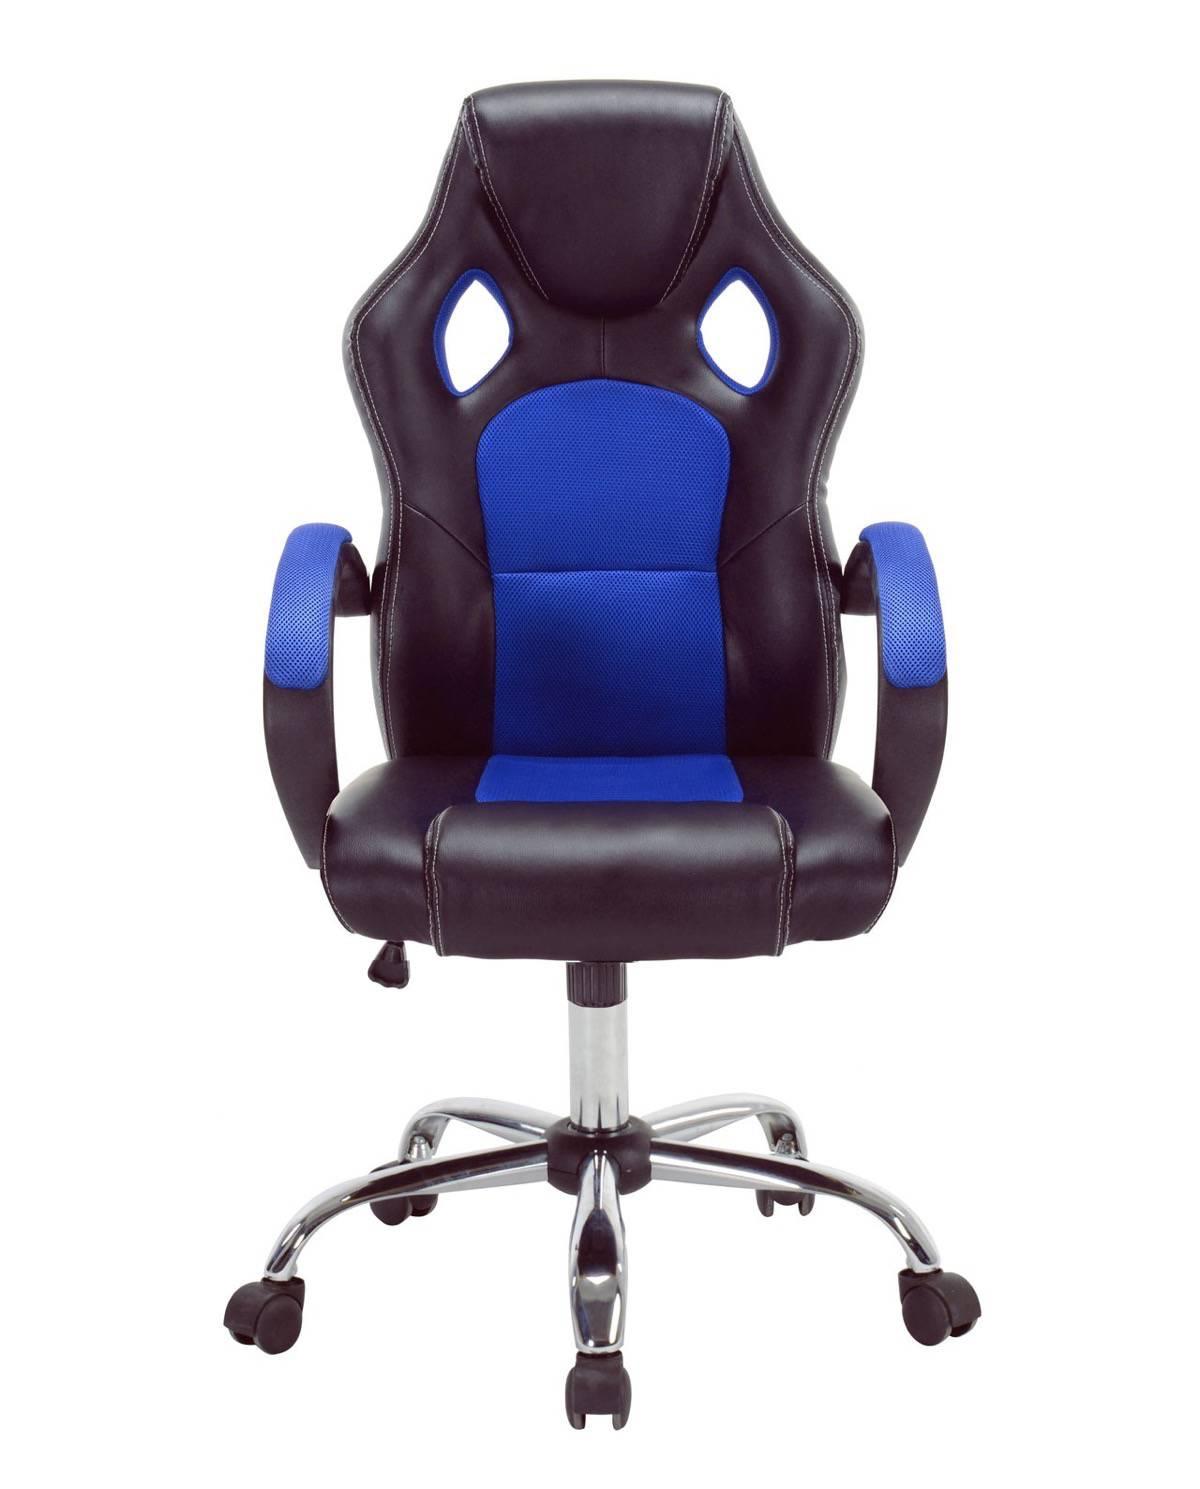 Lick chaise de bureau racing gaming pi tement chrome - Chaise de bureau racing ...